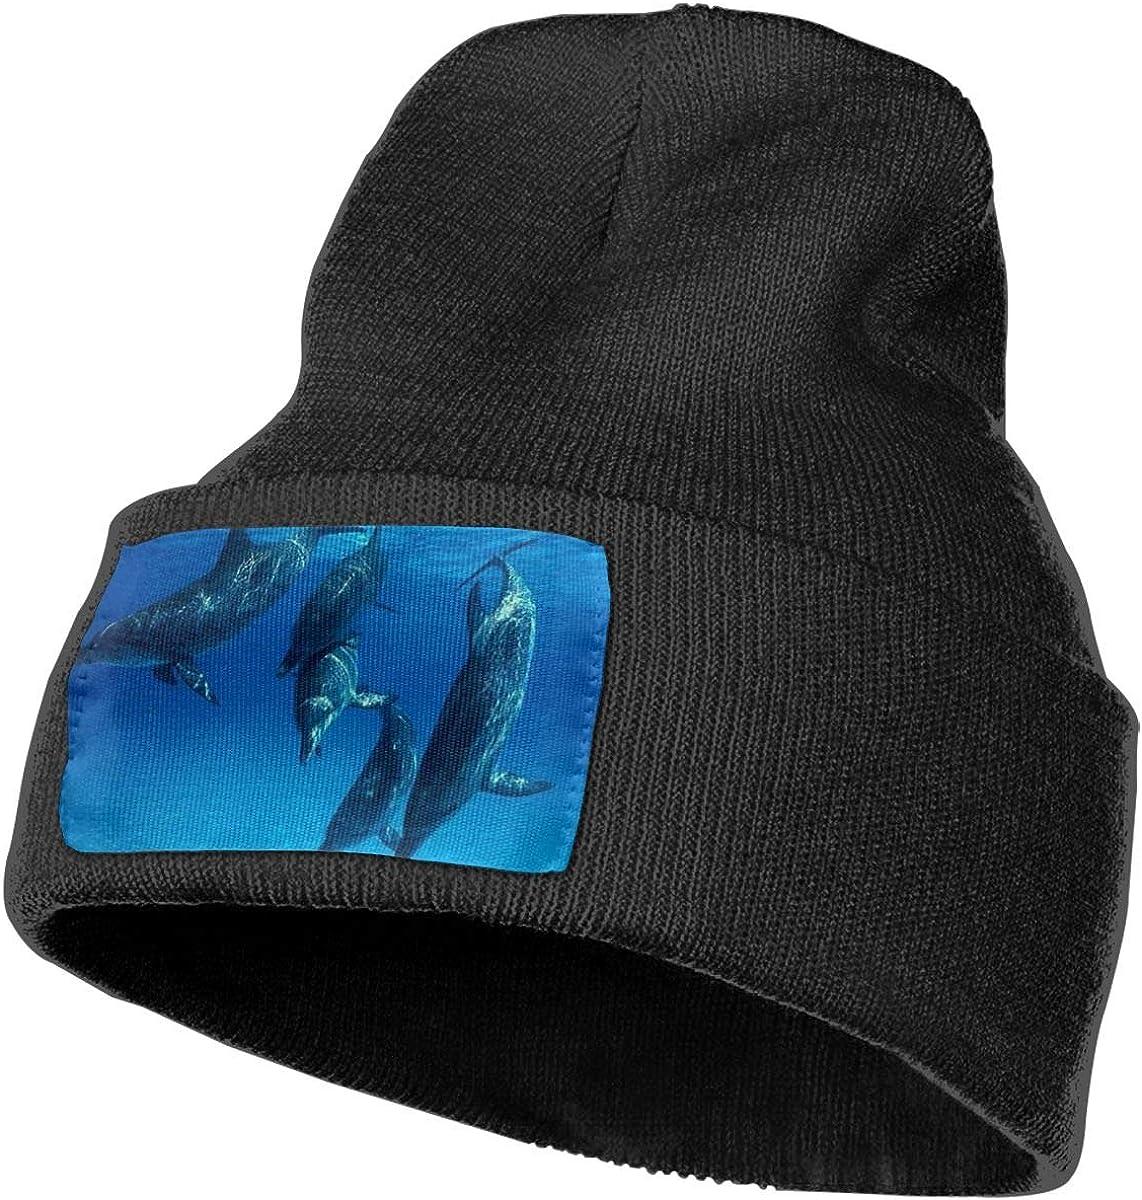 100/% Acrylic Acid Mas Beanie Hat Ruin Penguin Fashion Knitting Hat for Men Women